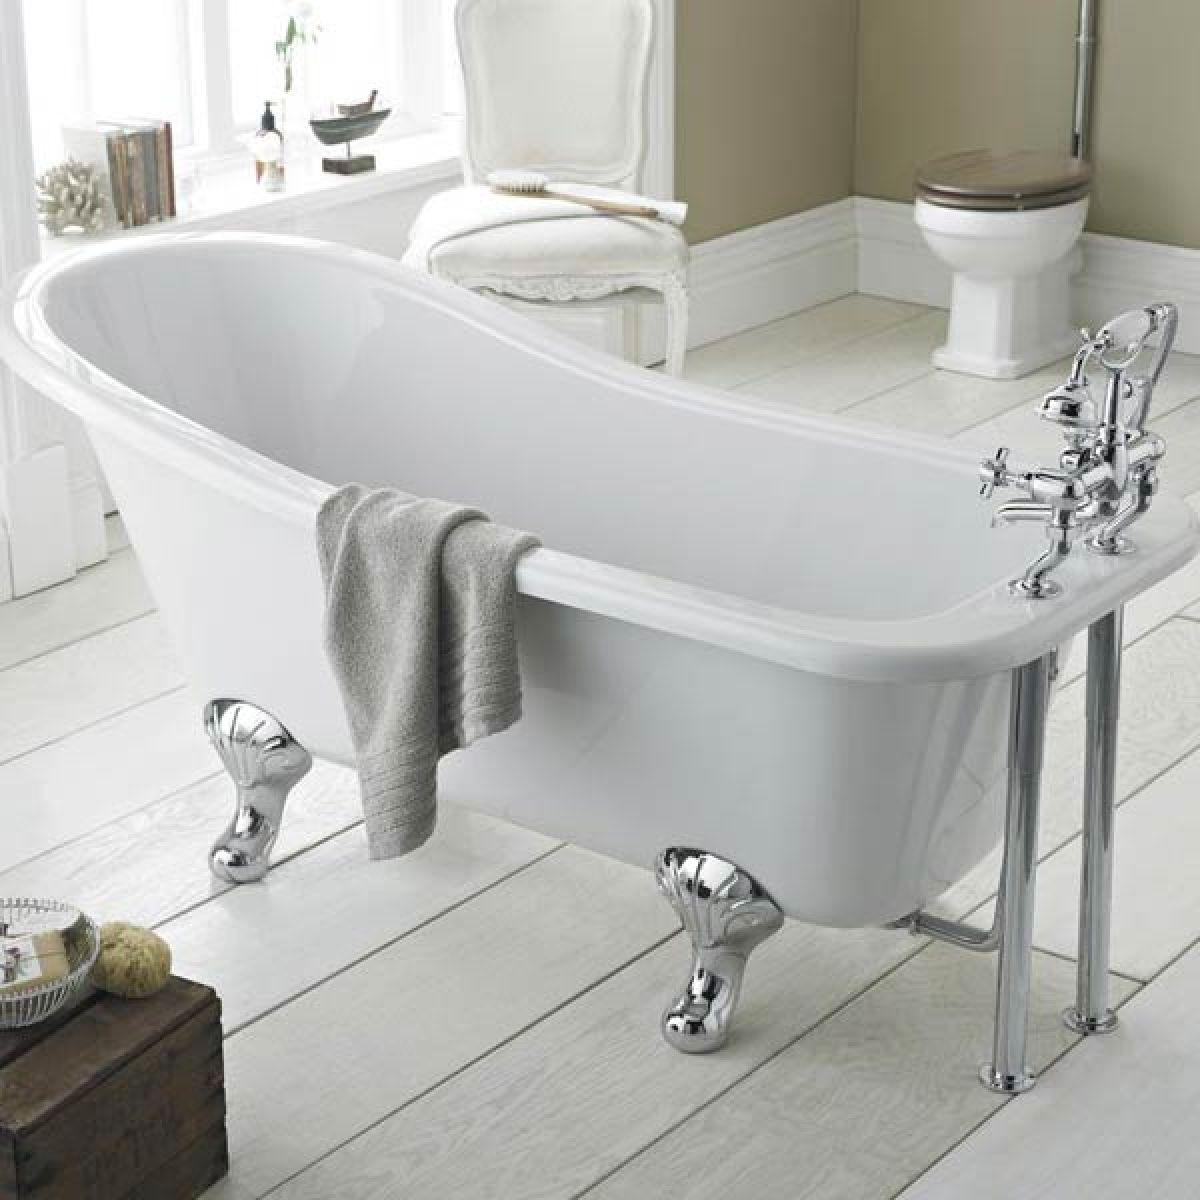 Premier Kensington Freestanding Slipper Bath with Leg Set Lifestyle